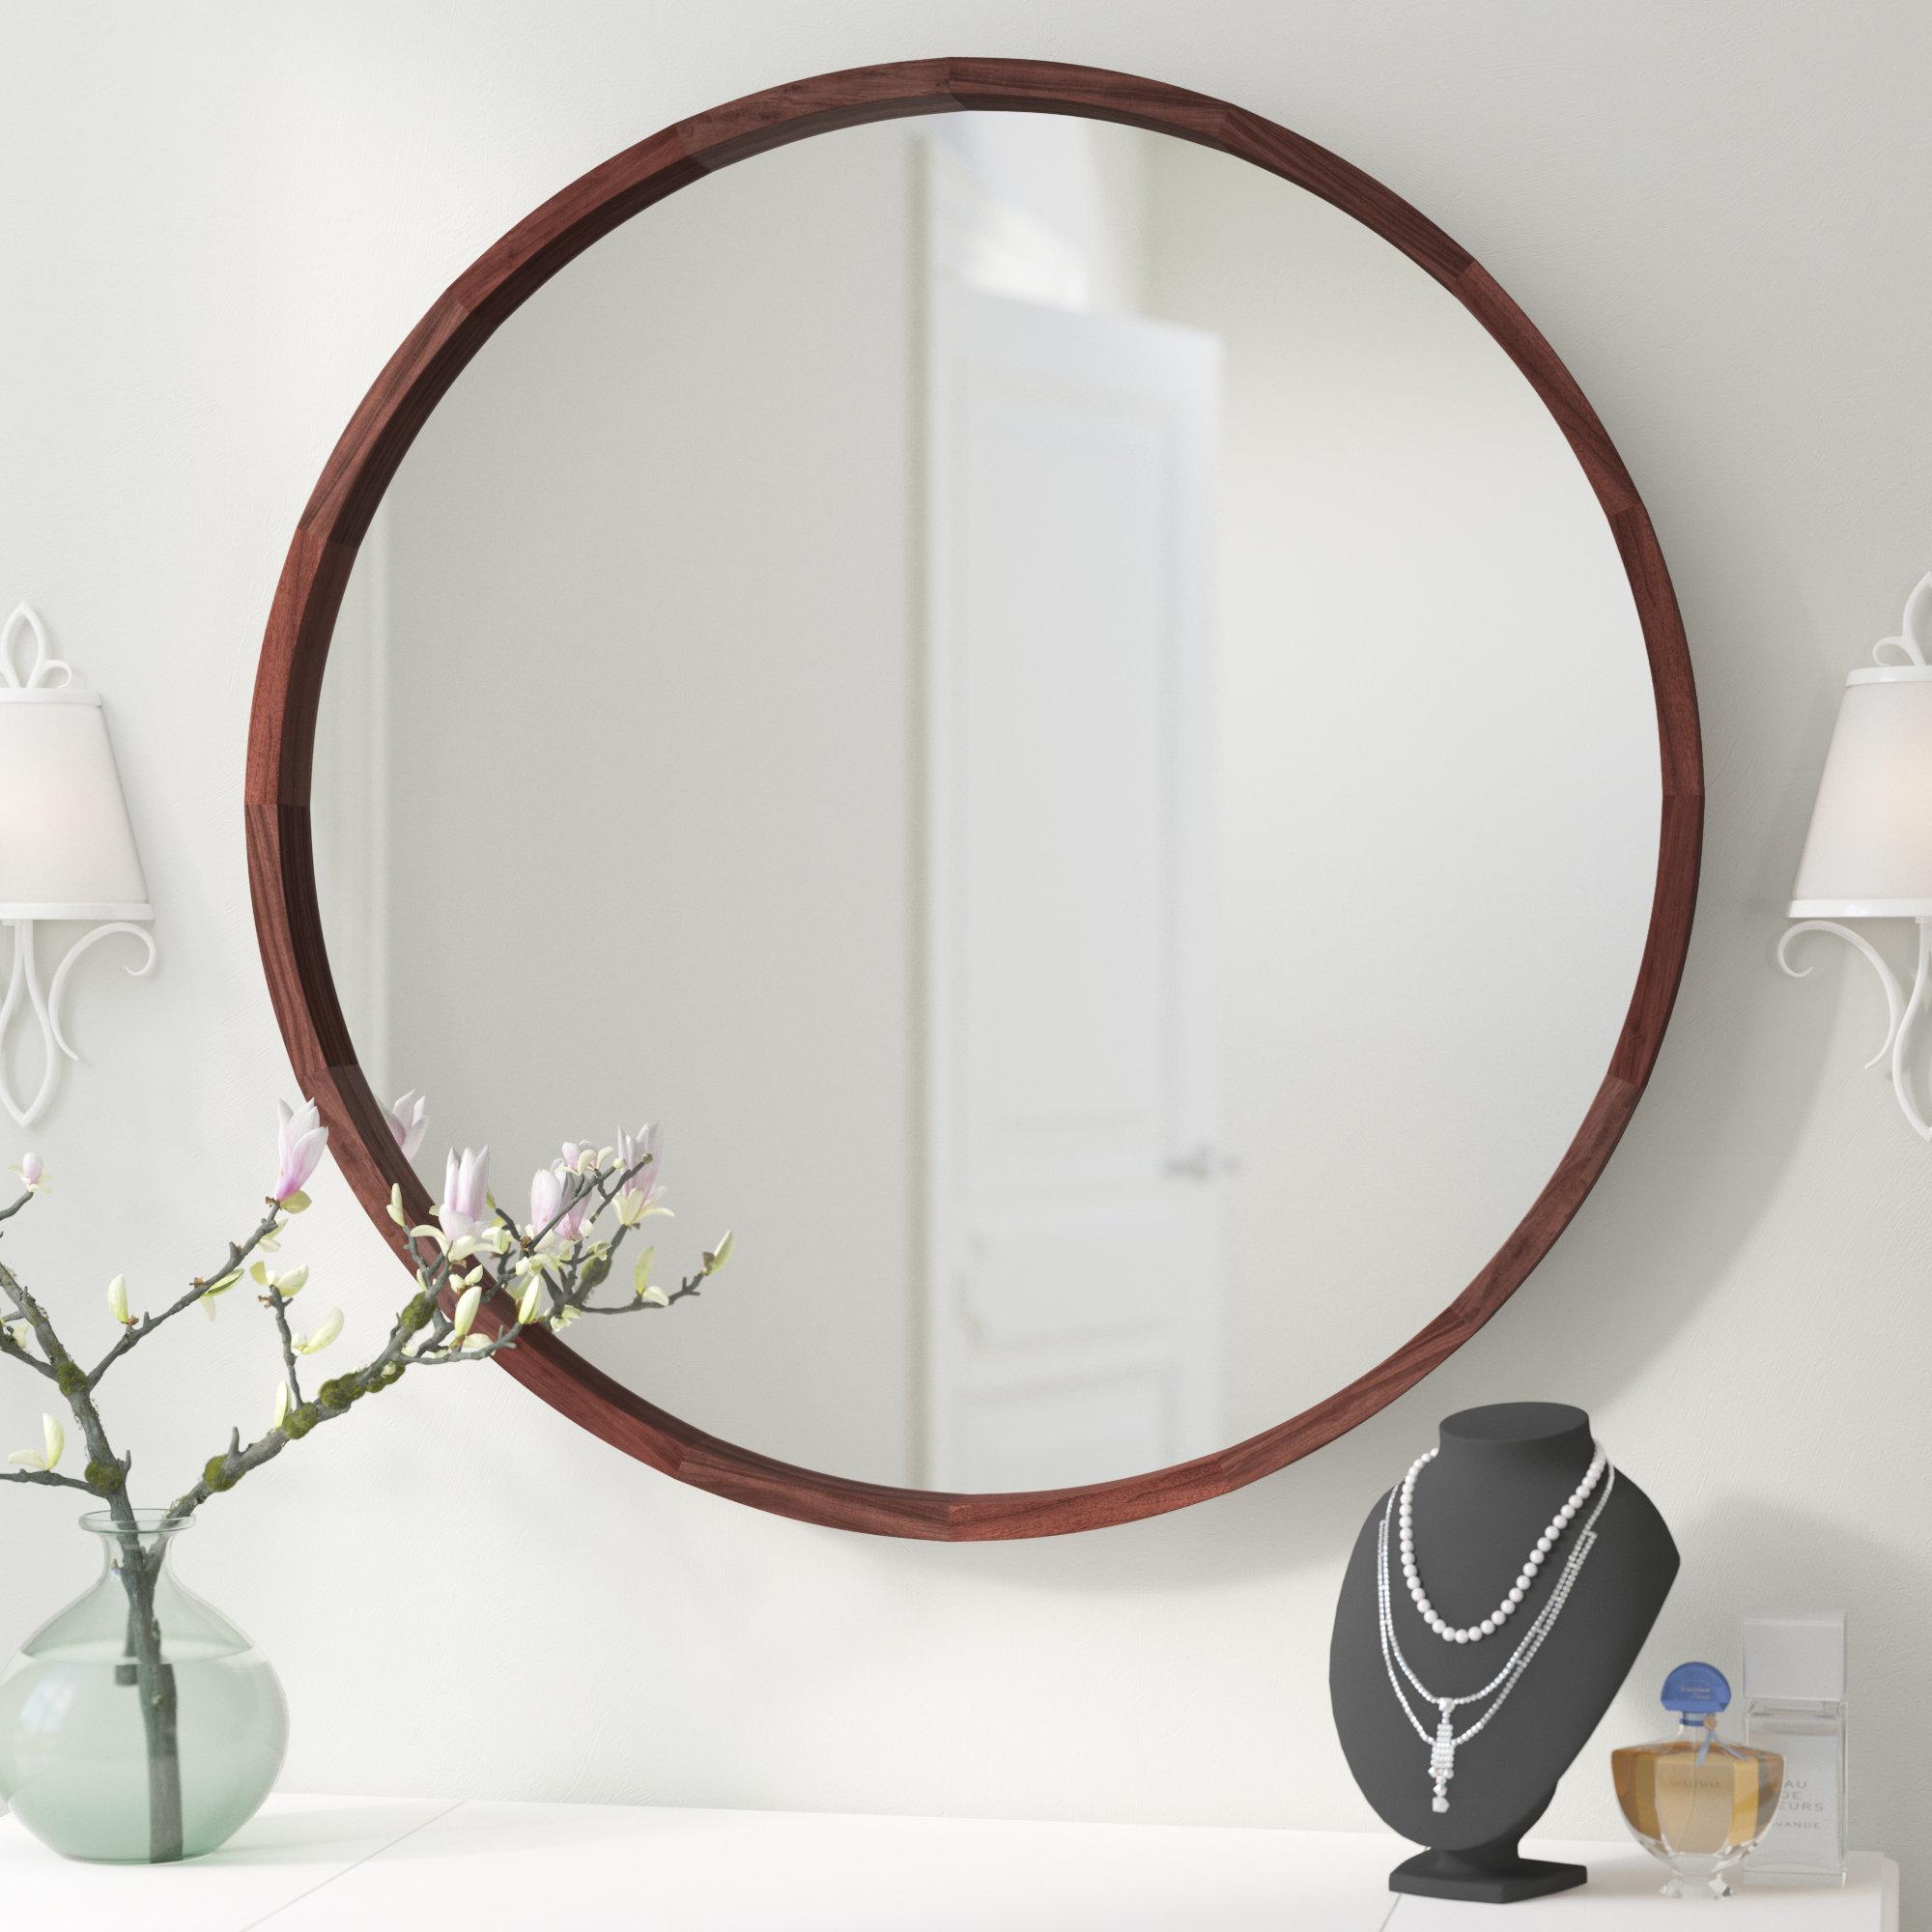 Loftis Modern & Contemporary Accent Wall Mirror With Colton Modern & Contemporary Wall Mirrors (View 23 of 30)